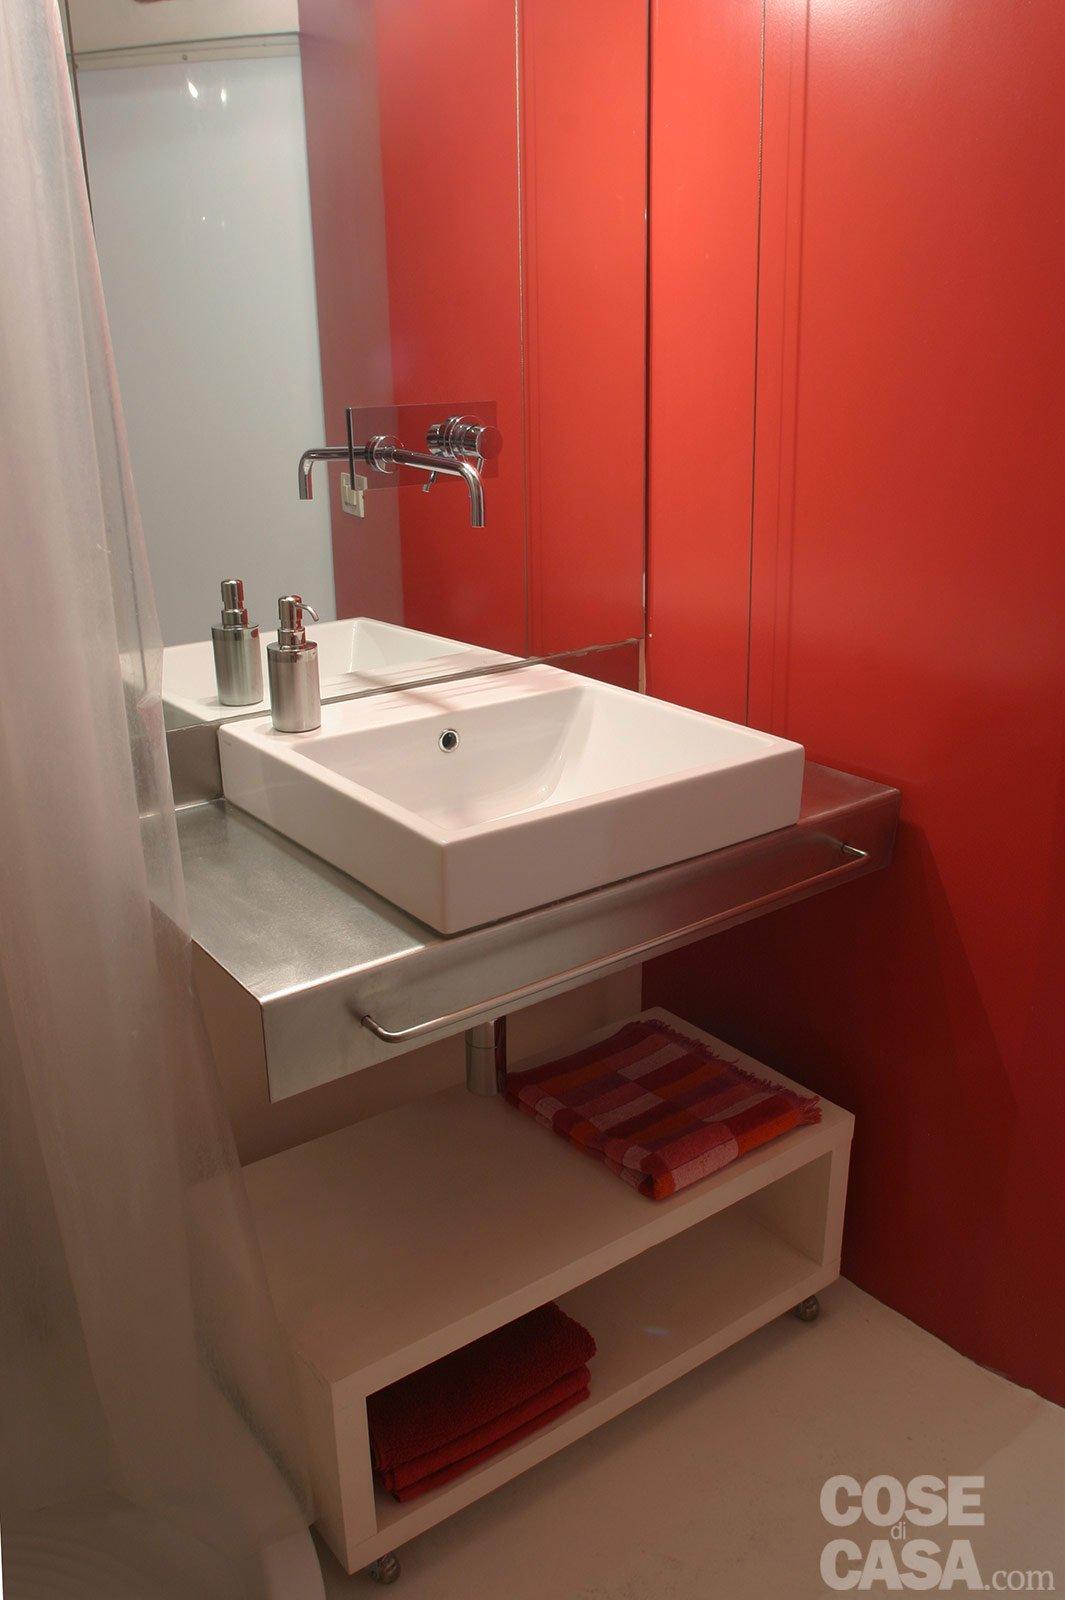 45 mq: una casa in bianco e rosso - Cose di Casa